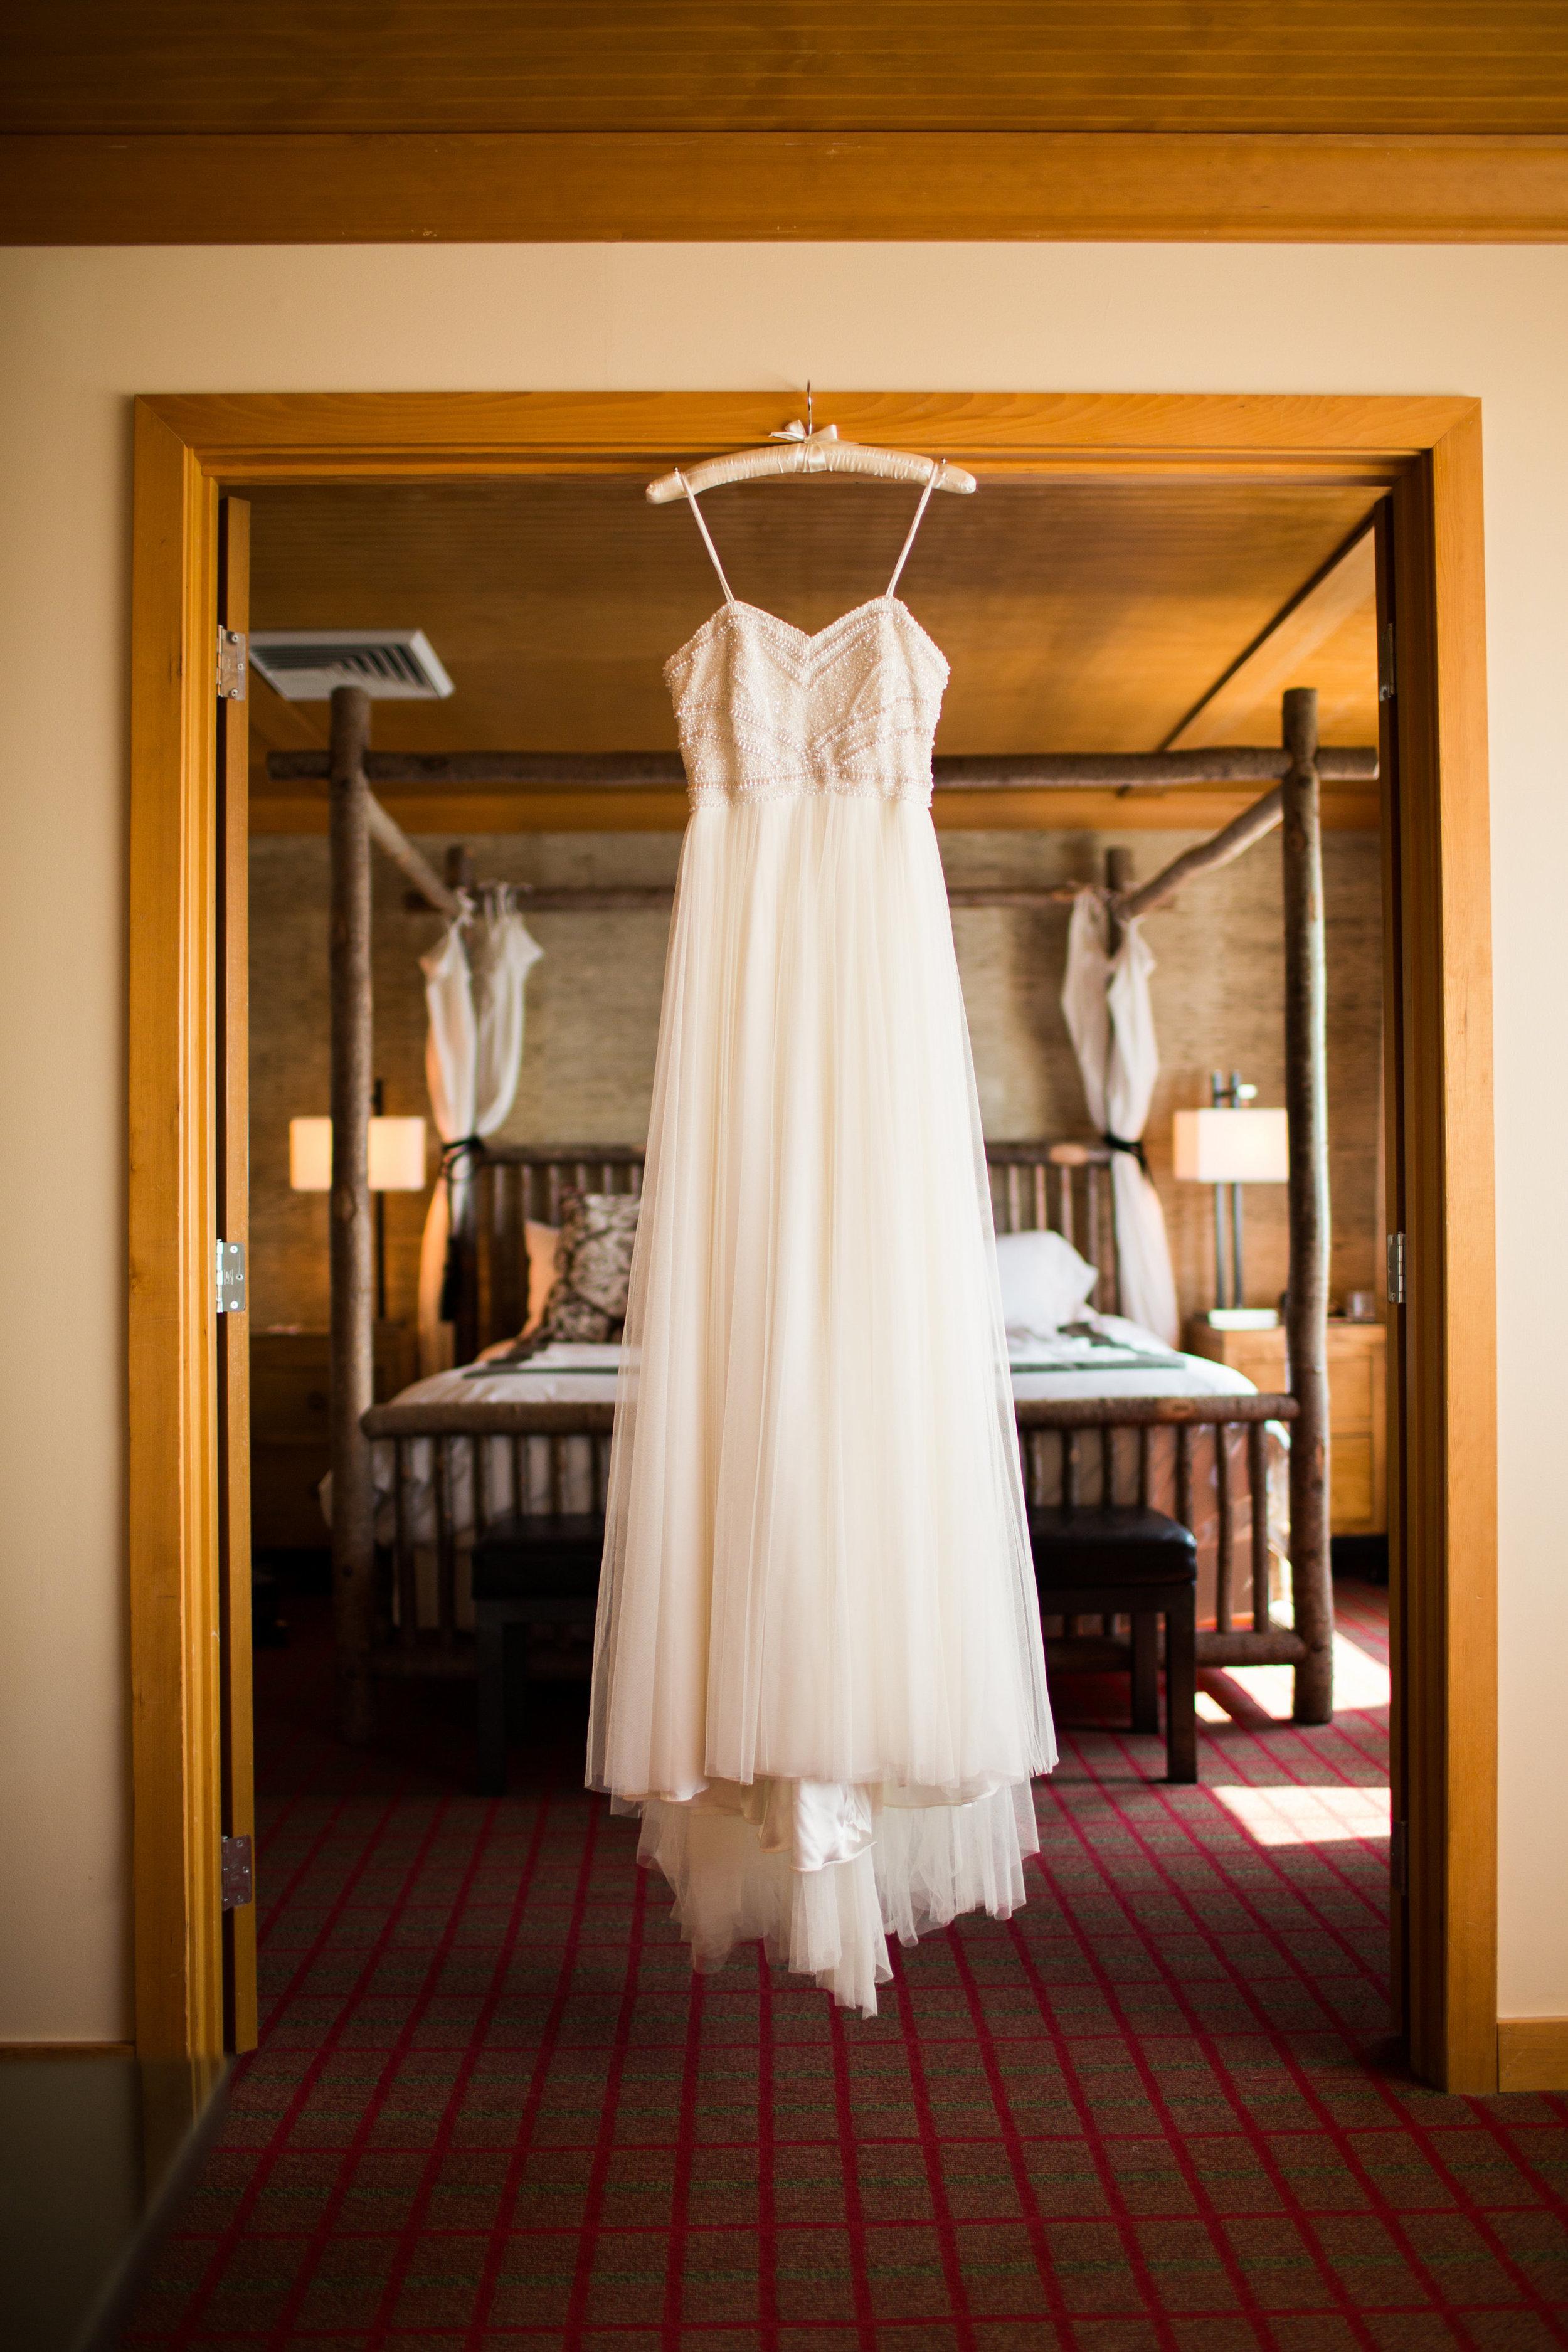 Seattle Wedding Planner, Wedding Wise | Ciccarelli Photography | Edgewater Hotel Wedding | Wedding Dress Shot